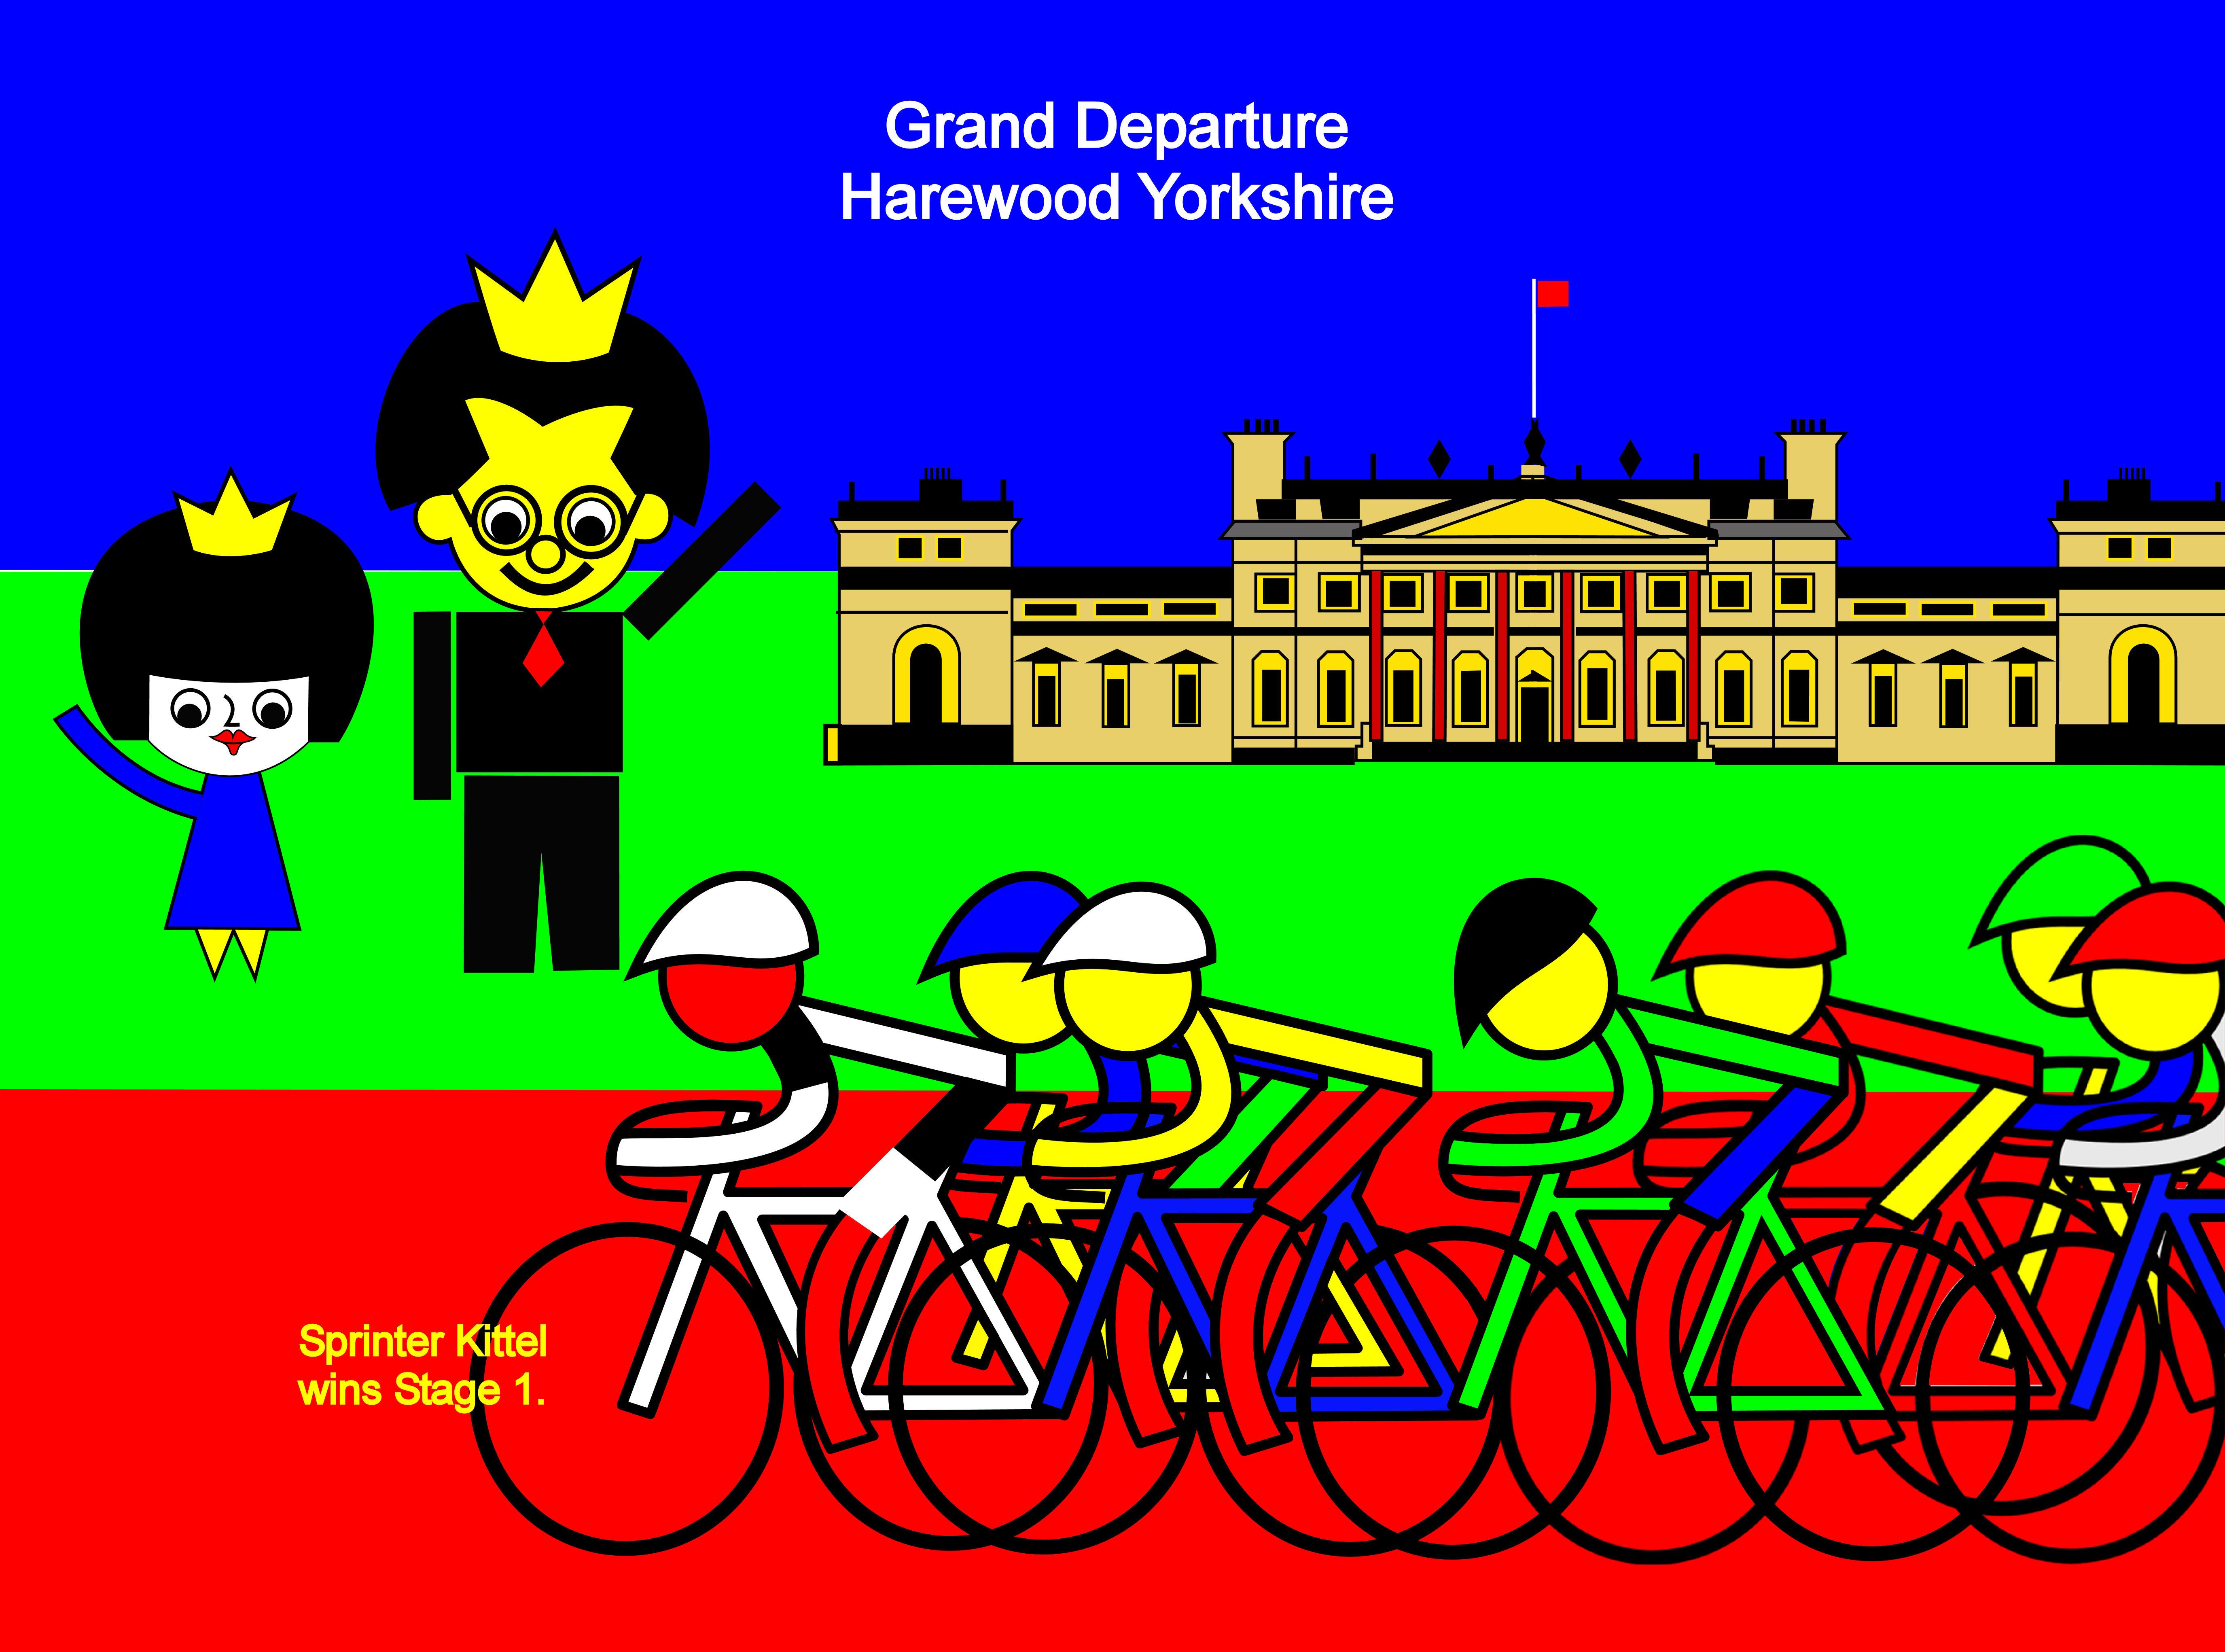 Leeds, Harrogate, Grand                                     Departure, Harewood, Yorkshire,                                     Sprinter, Kittel, Stage 1, July 5th,                                     Tour de France 2014, Tour de France,                                     Leeds, Harrogate, le Grand Départ,                                     Harewood, Yorkshire, Sprinter,                                     Kittel, étape 1, 5 Juillet, Tour de                                     France 2014, Tour de France